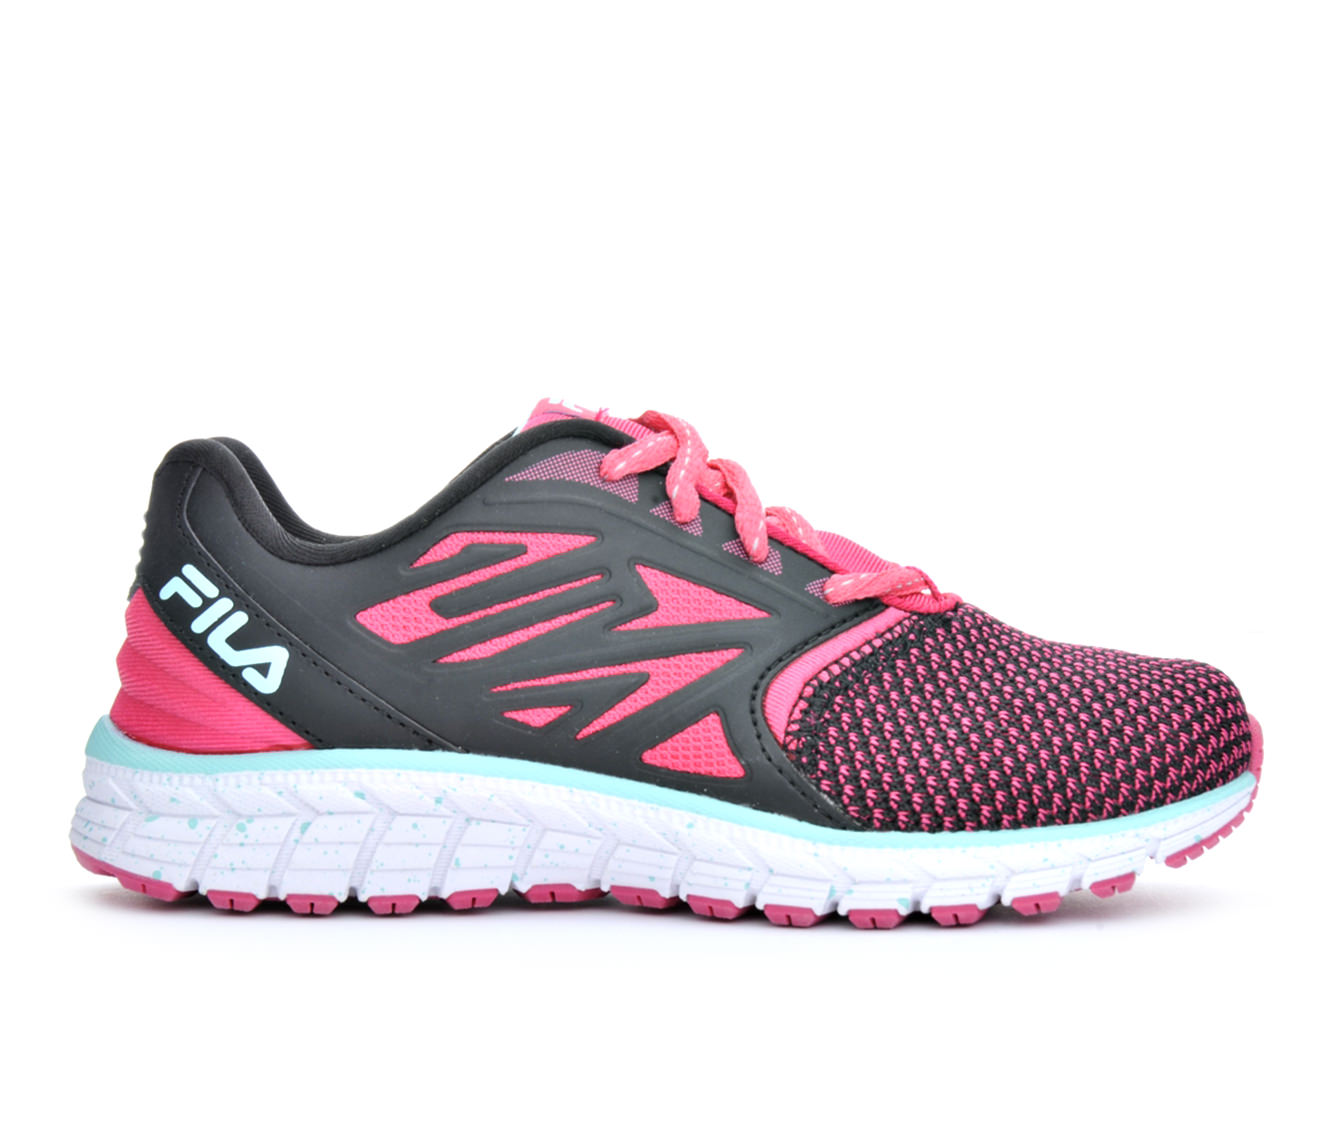 Girls' Fila Broadwave Running Shoes (Pink - Size 10.5 - Little Kid) 1655404